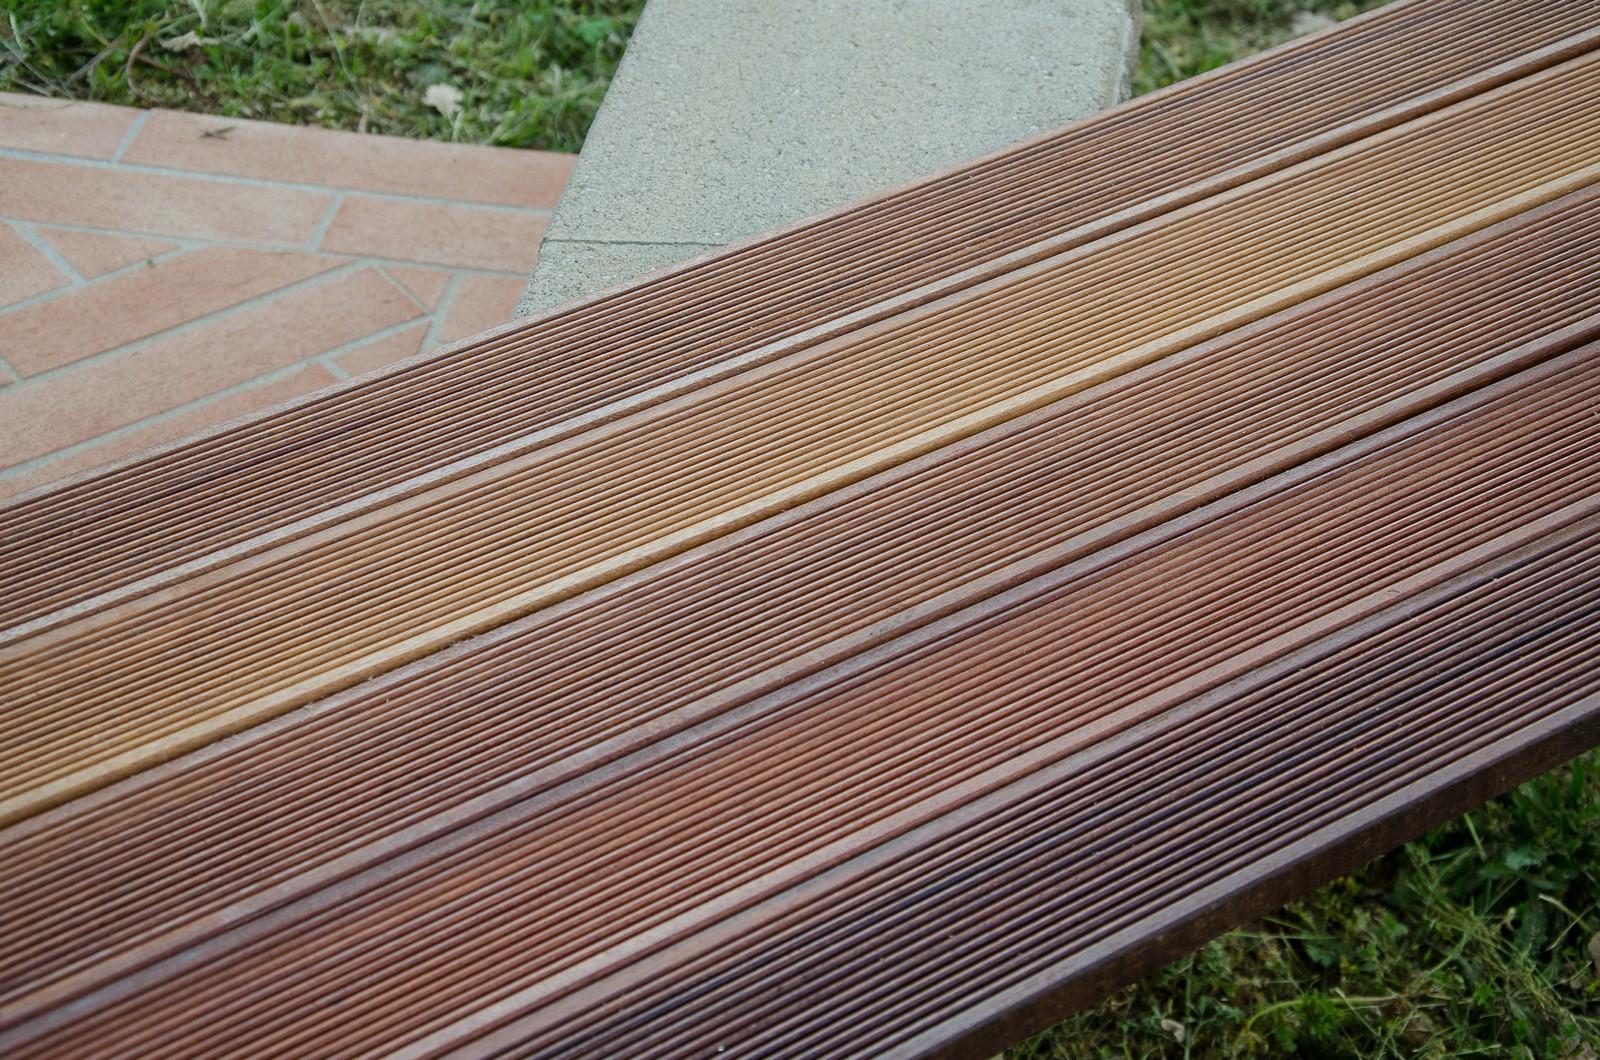 Pavimento in legno da esterno decking cumaru teak - Pavimento in legno esterno ...